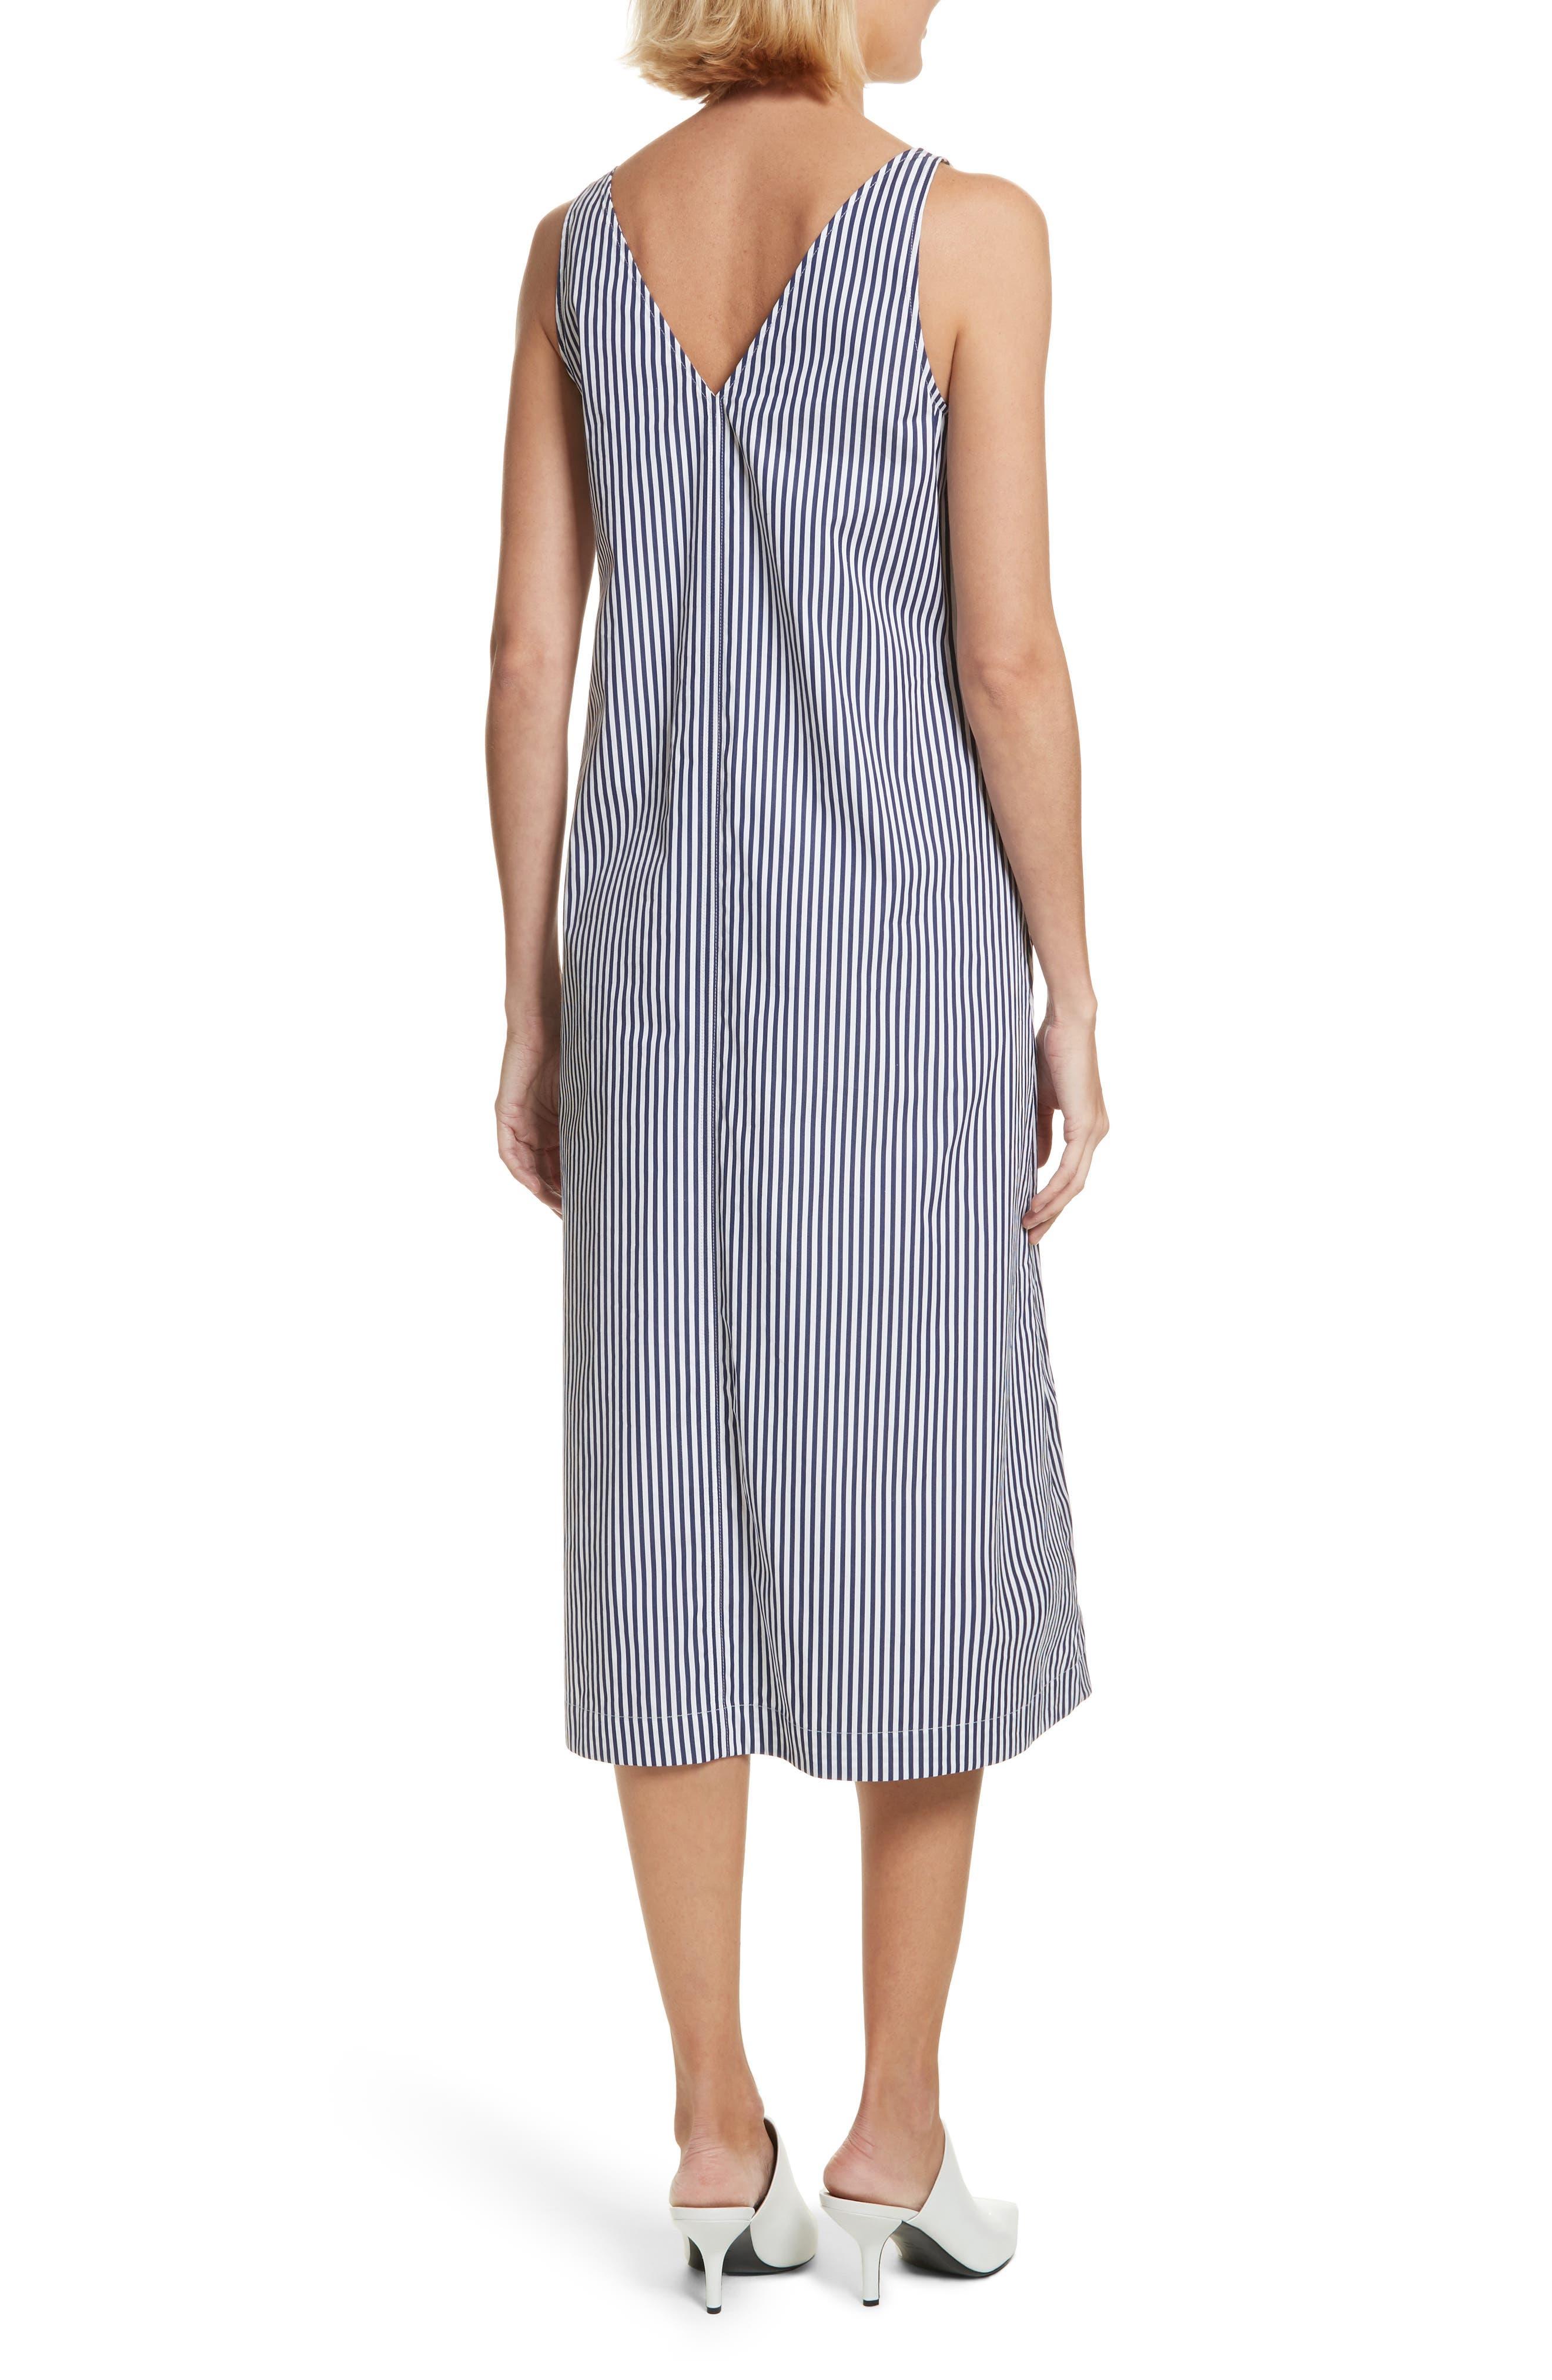 Davey Candy Stripe Shift Dress,                             Alternate thumbnail 2, color,                             456